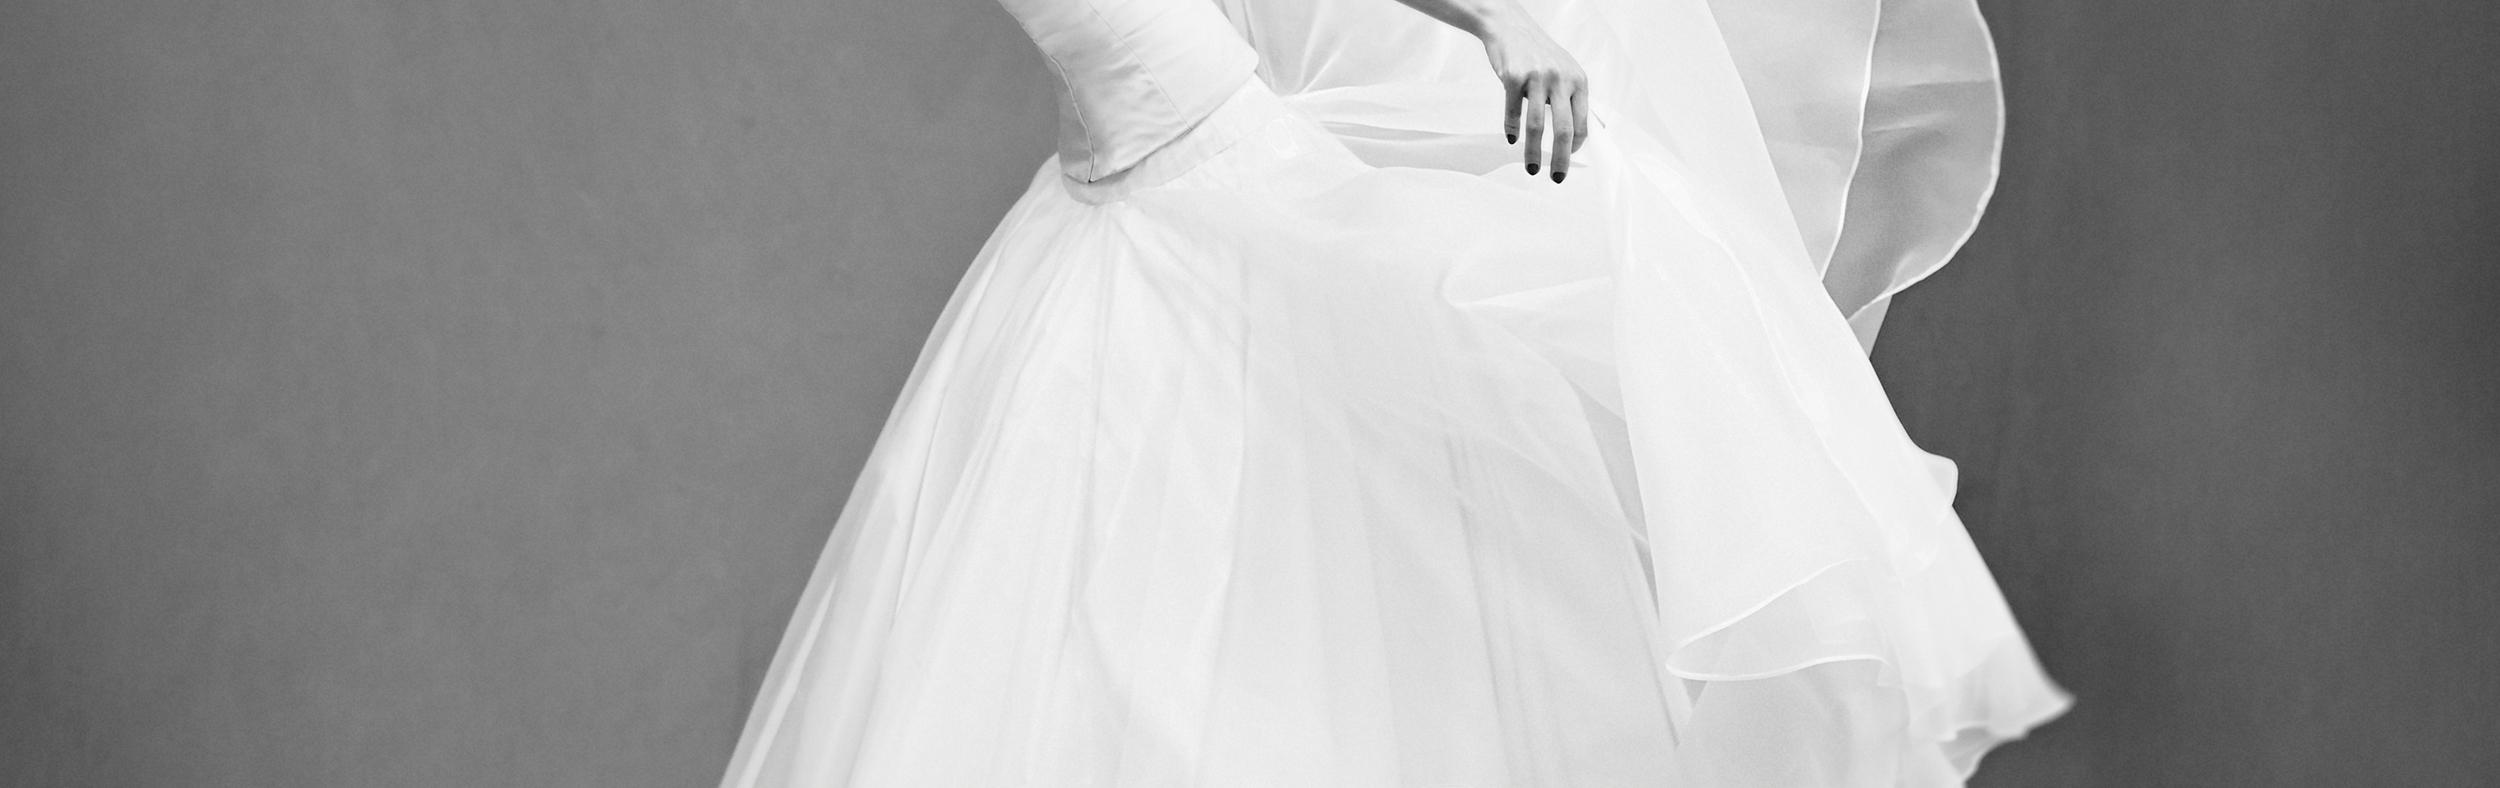 bridal skirt in organza